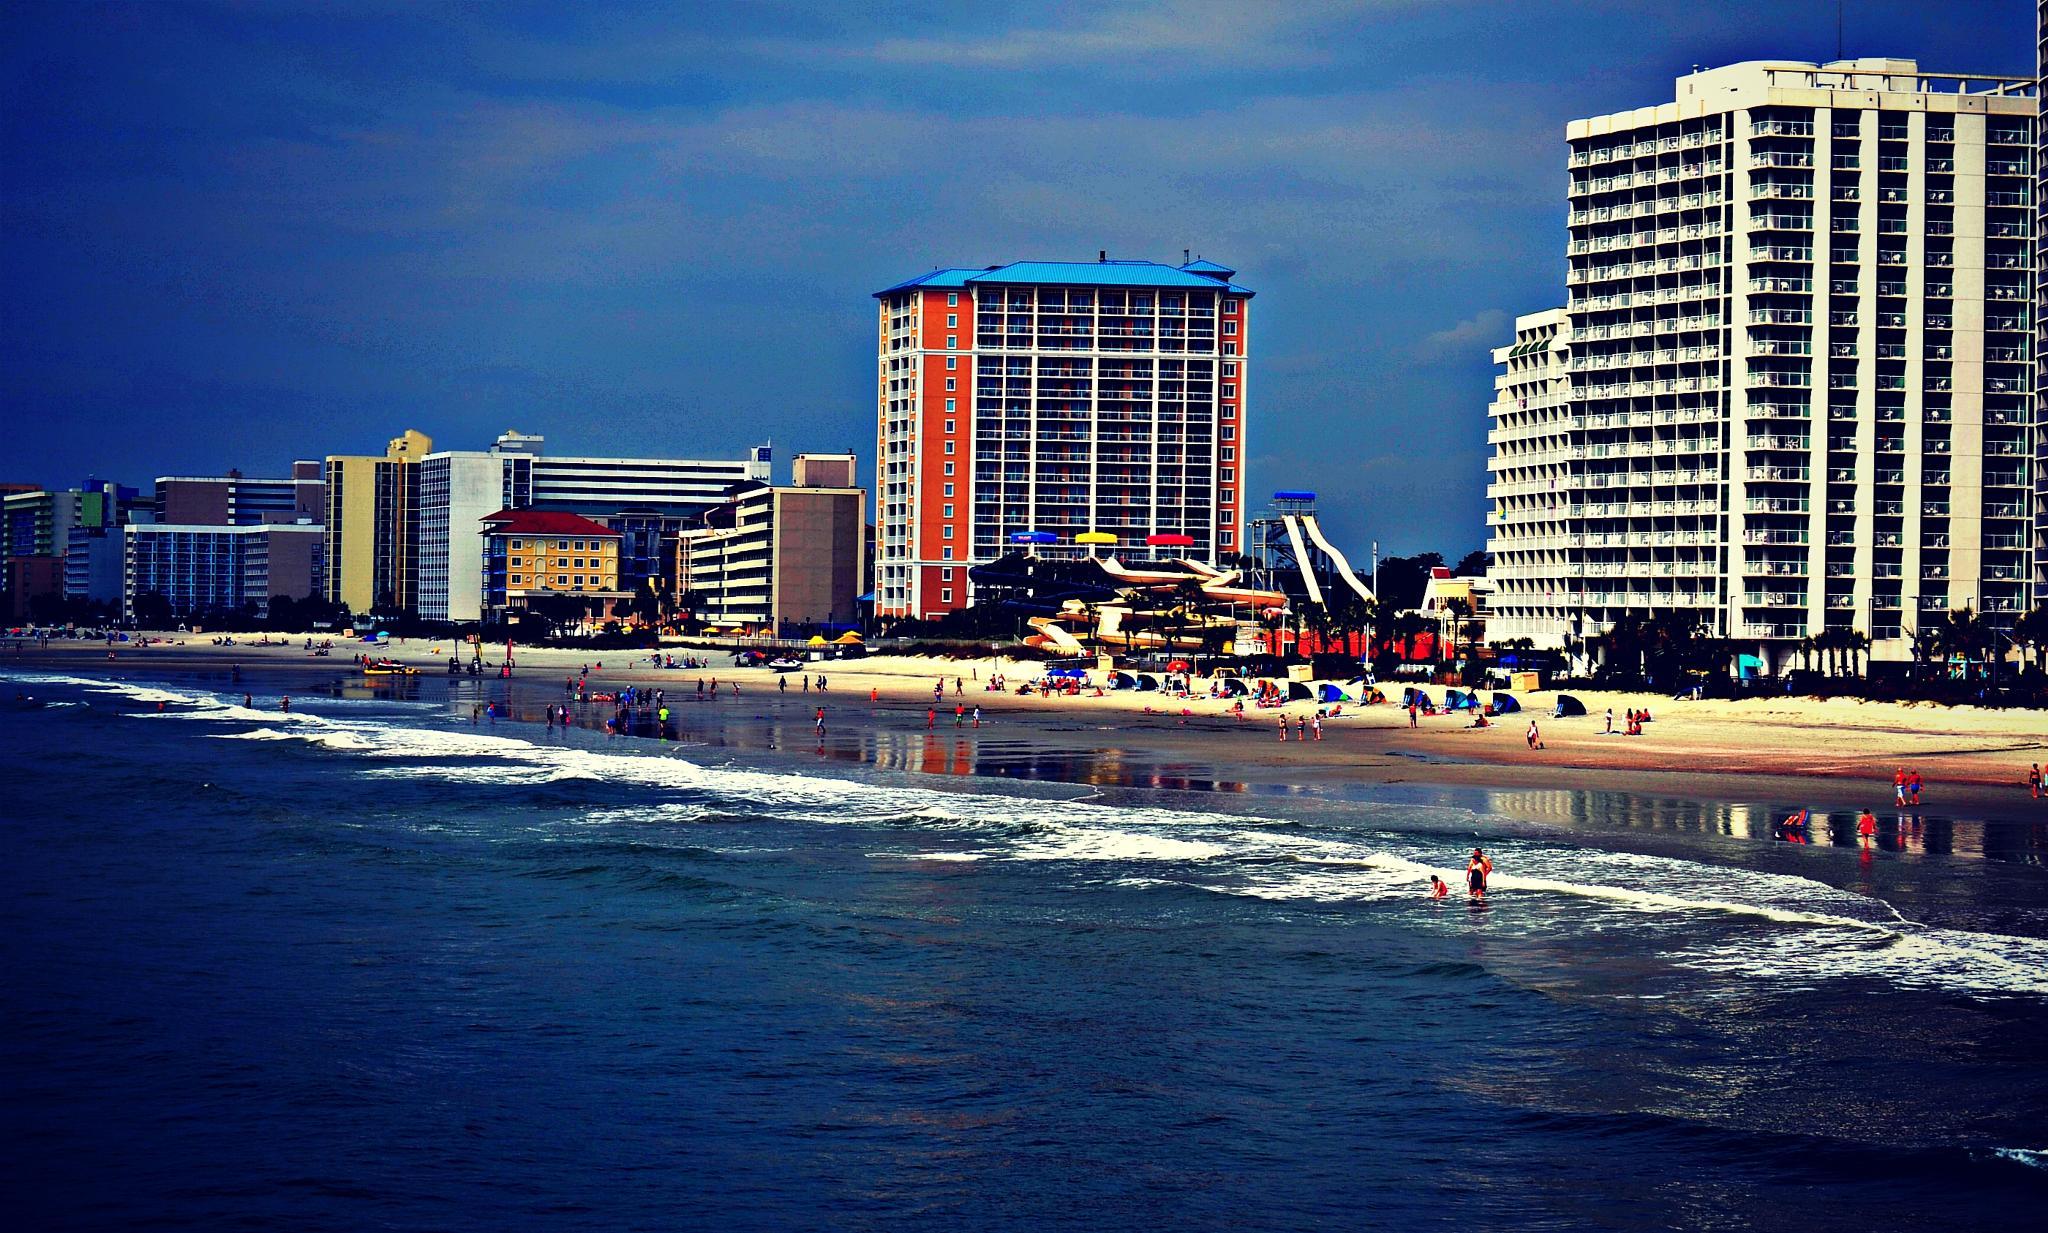 Myrtle Beach SC by lindandarrell